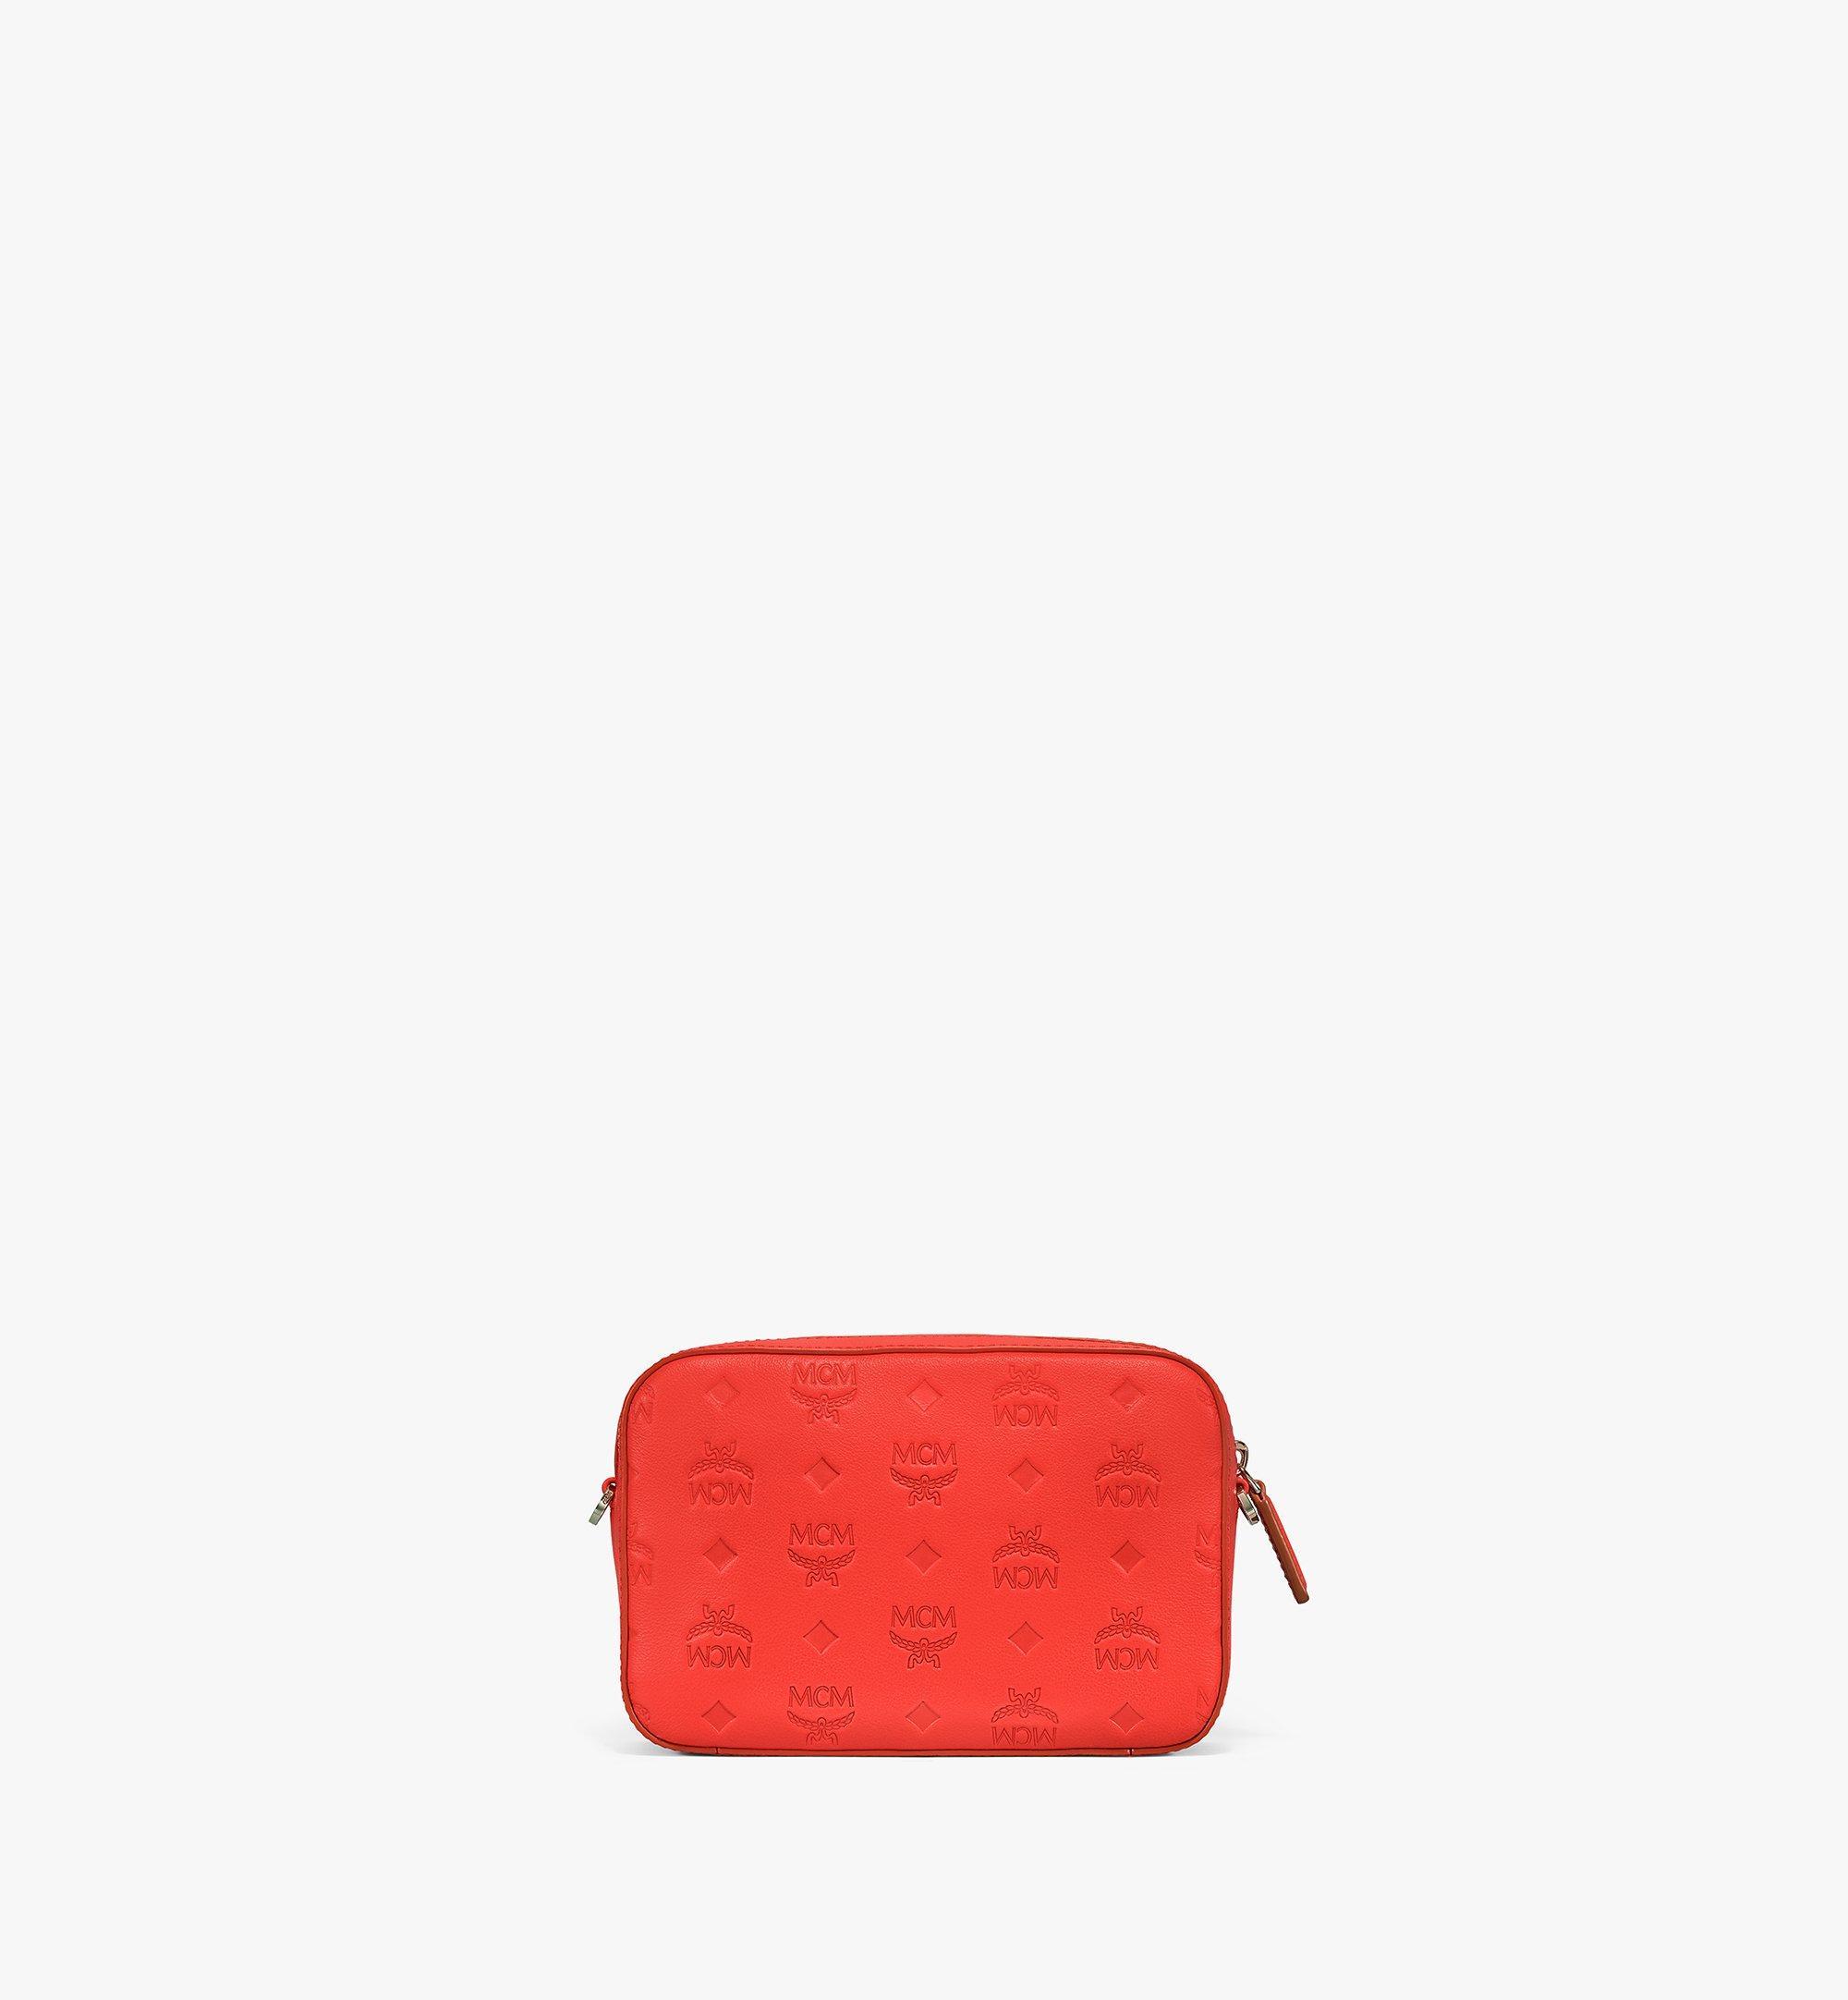 MCM Camera Bag in Monogram Leather Red MWRAAKM01R8001 Alternate View 3